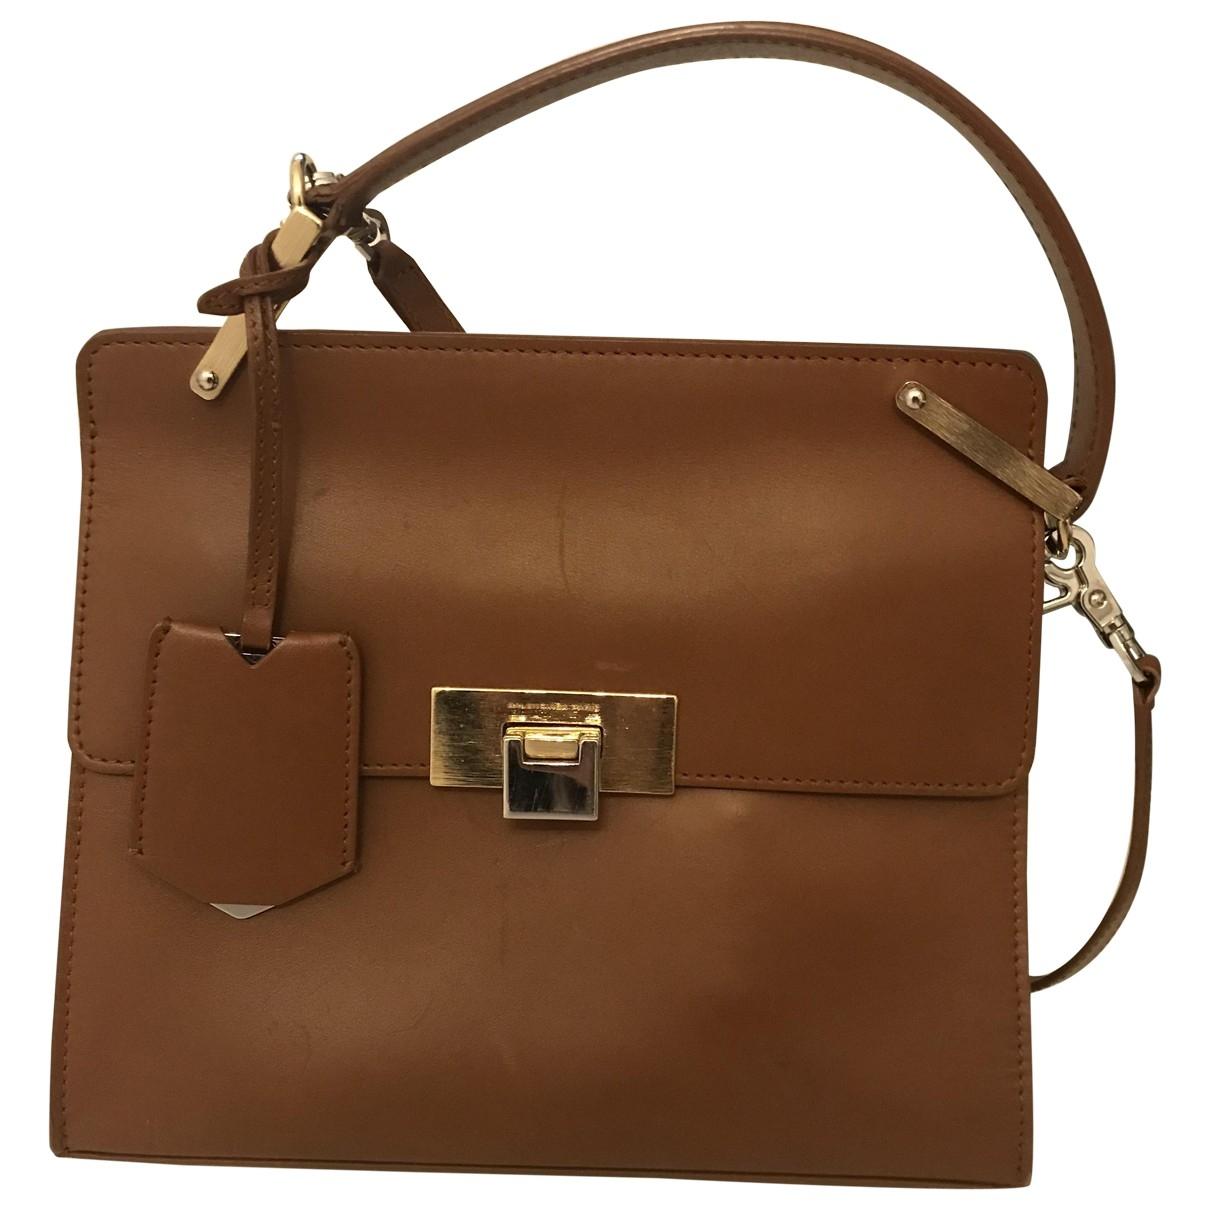 Balenciaga - Sac a main Le Dix pour femme en cuir - marron